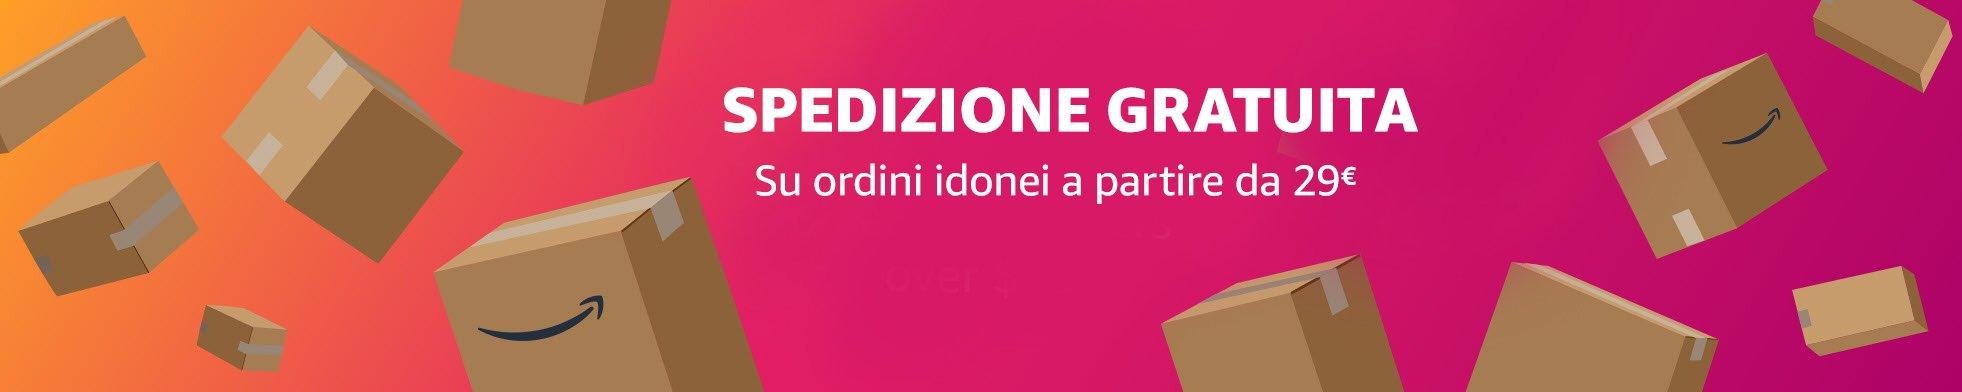 Spedizione Standard gratuita per odini idonei a partire da EUR 29.